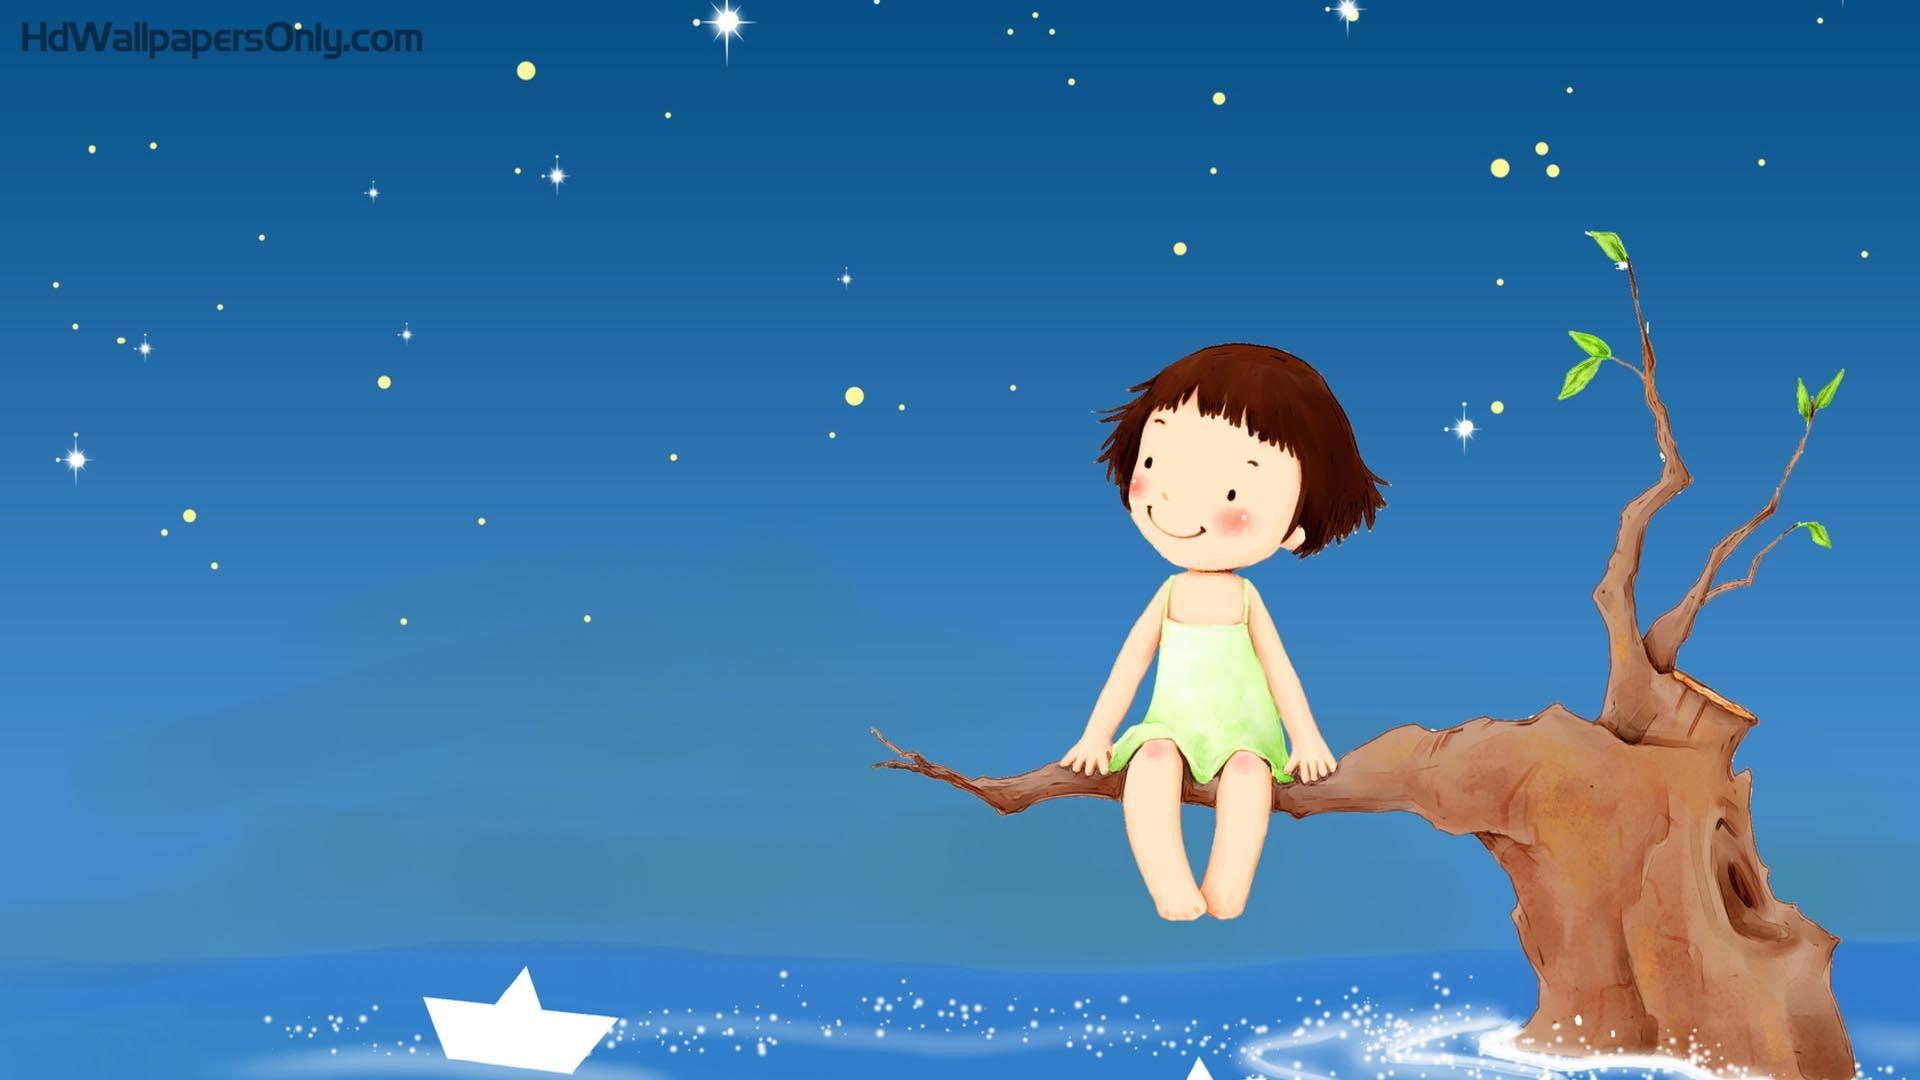 Cute Cartoon Backgrounds Free Download: Cute Cartoon Character Wallpaper (61+ Images